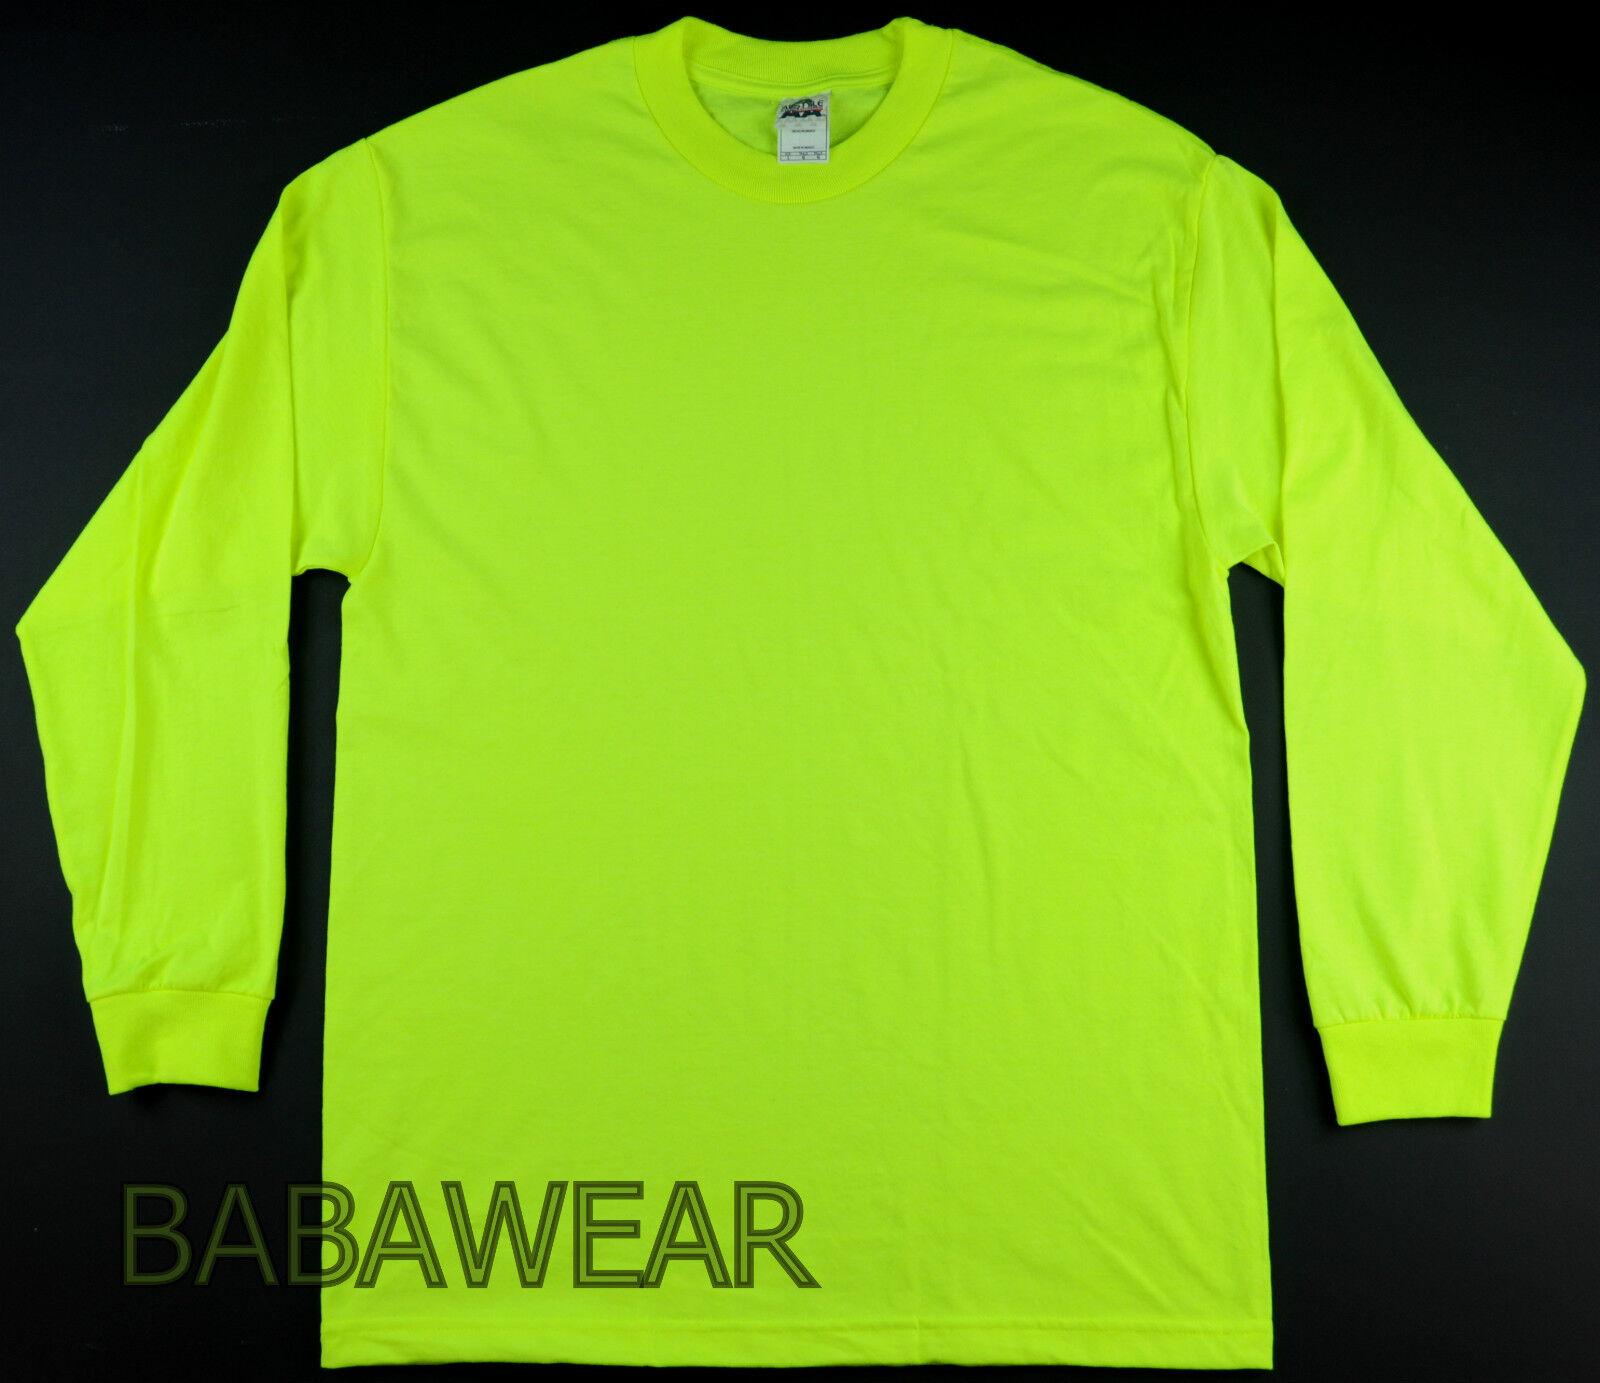 9151d6bd 4 LONG SLEEVE SHIRTS HIGH VISIBILITY SAFETY GREEN PLAIN BRIGHT TEE NEON AAA  nnwvhm2676-T-Shirts